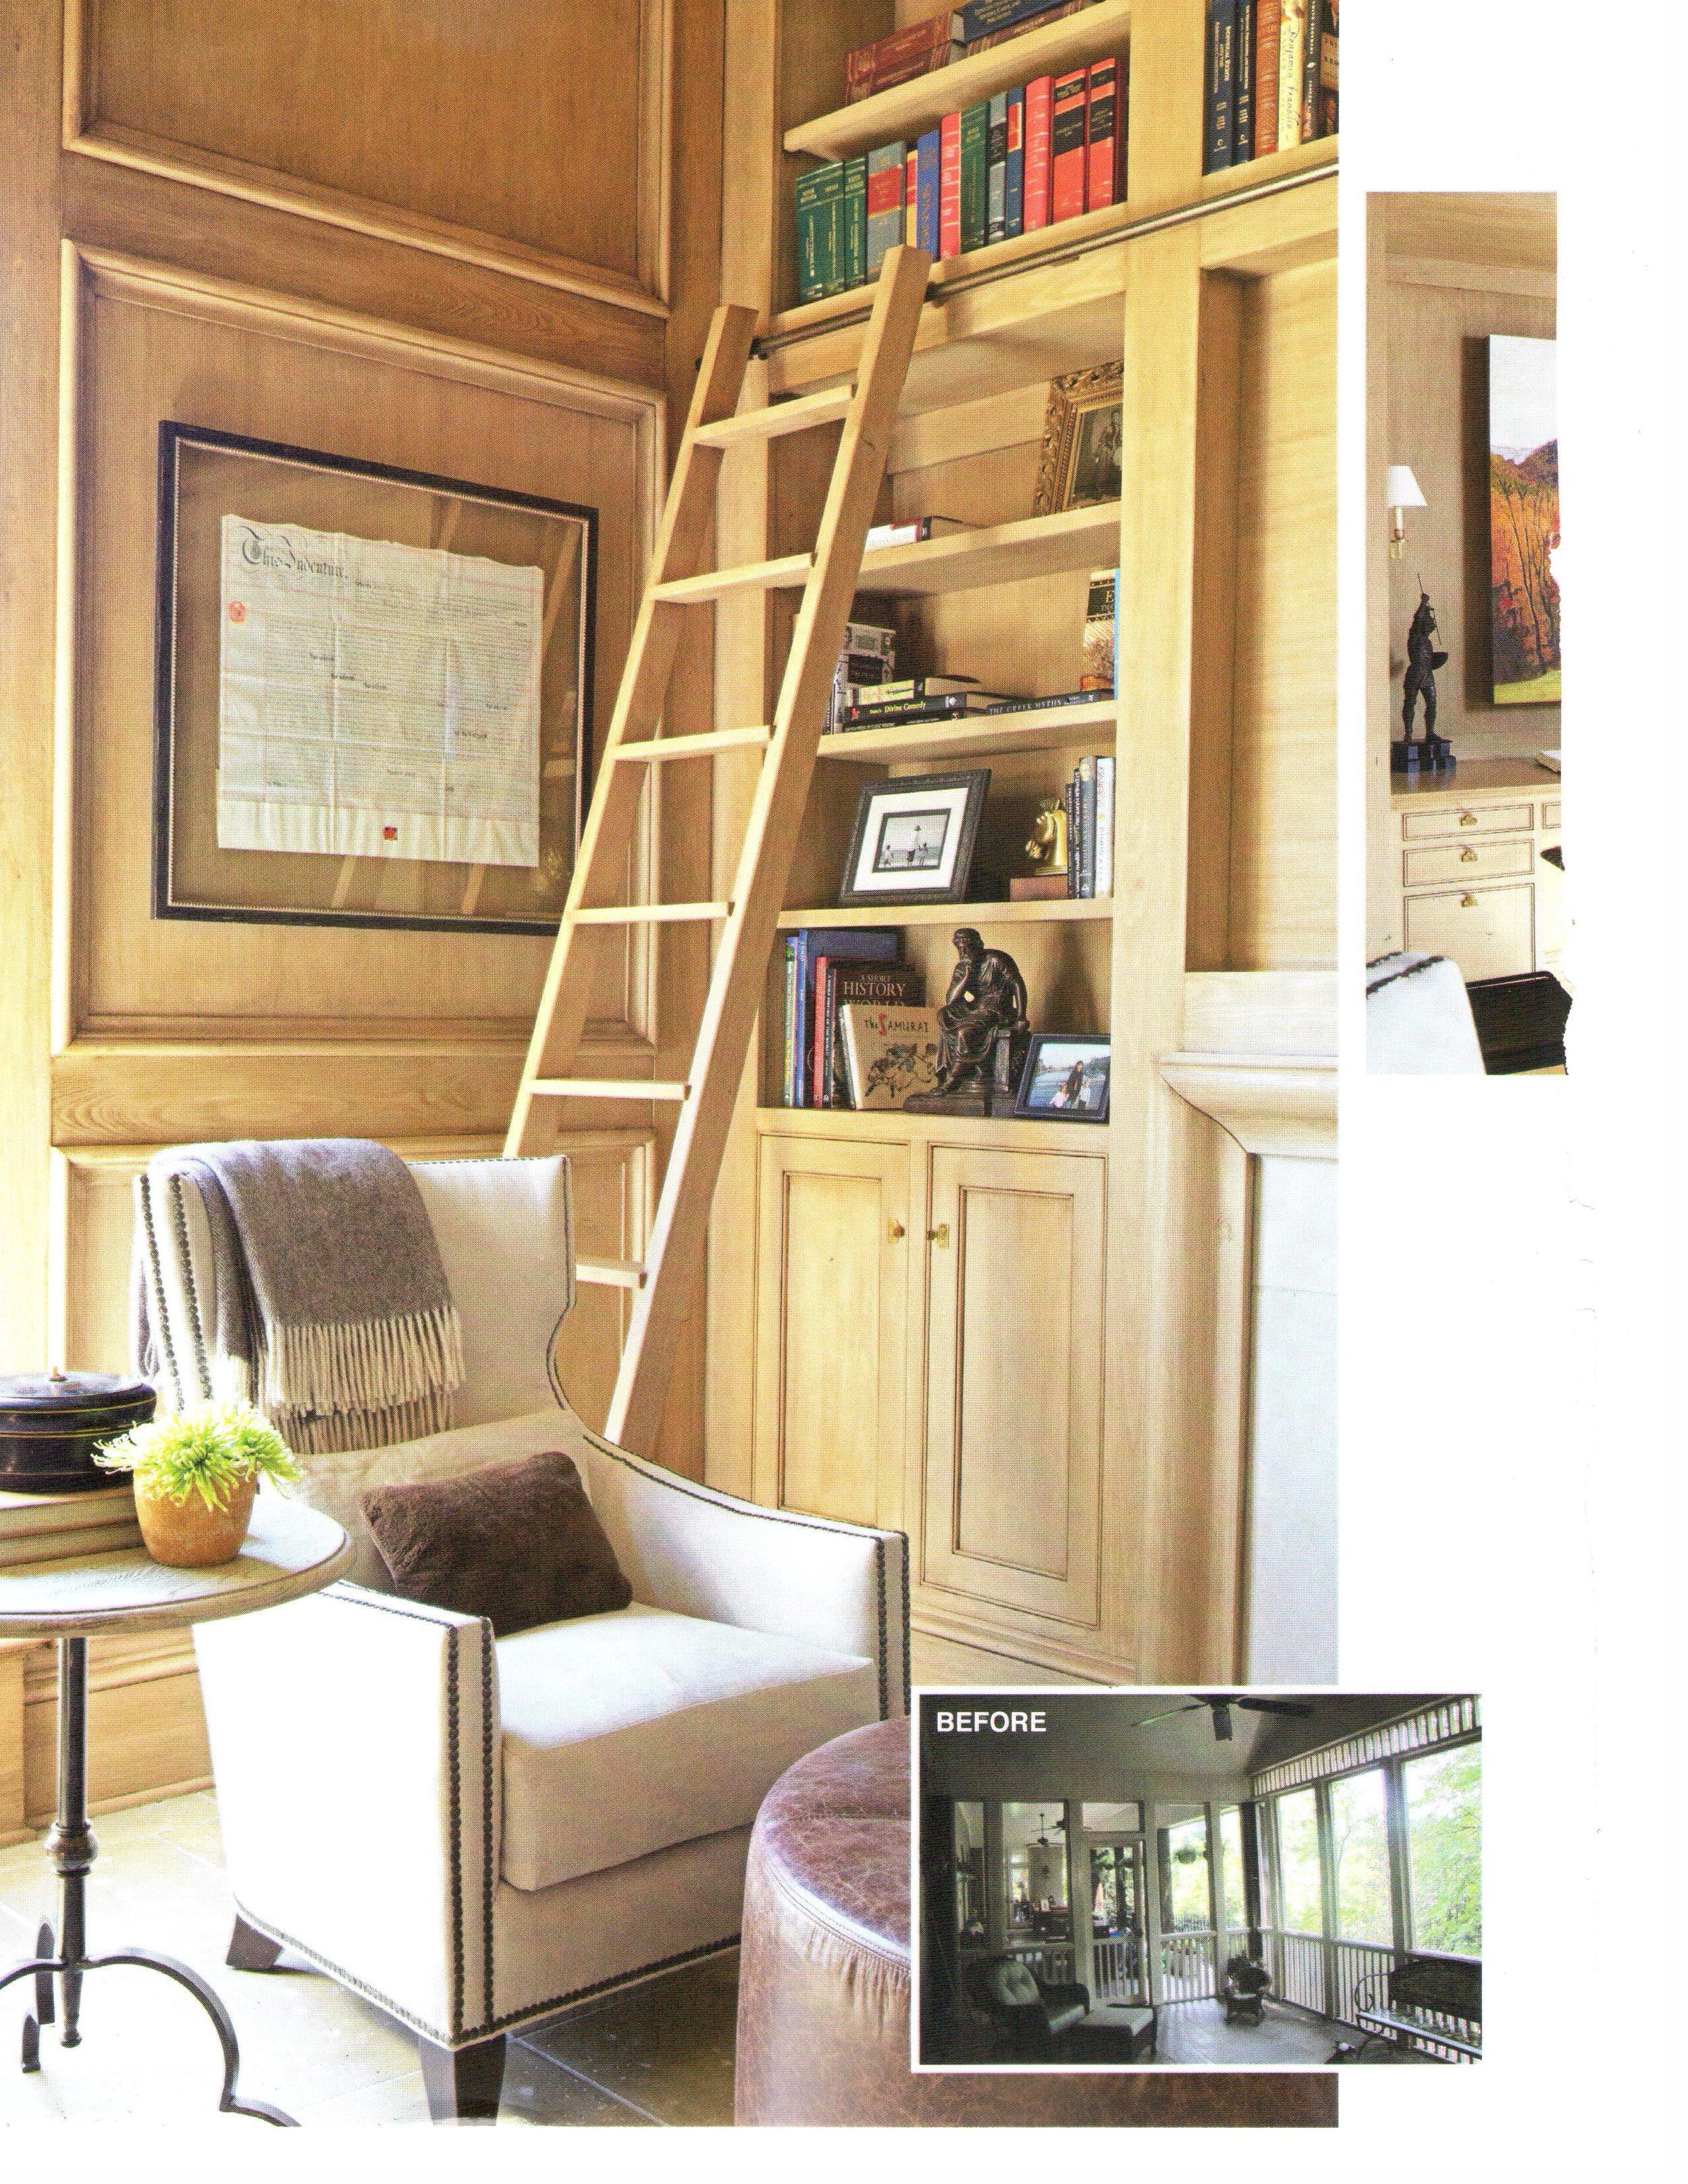 B'Ham Home & Garden Suite Upgrade magazine page 1 architecture exterior and interior design Alabama